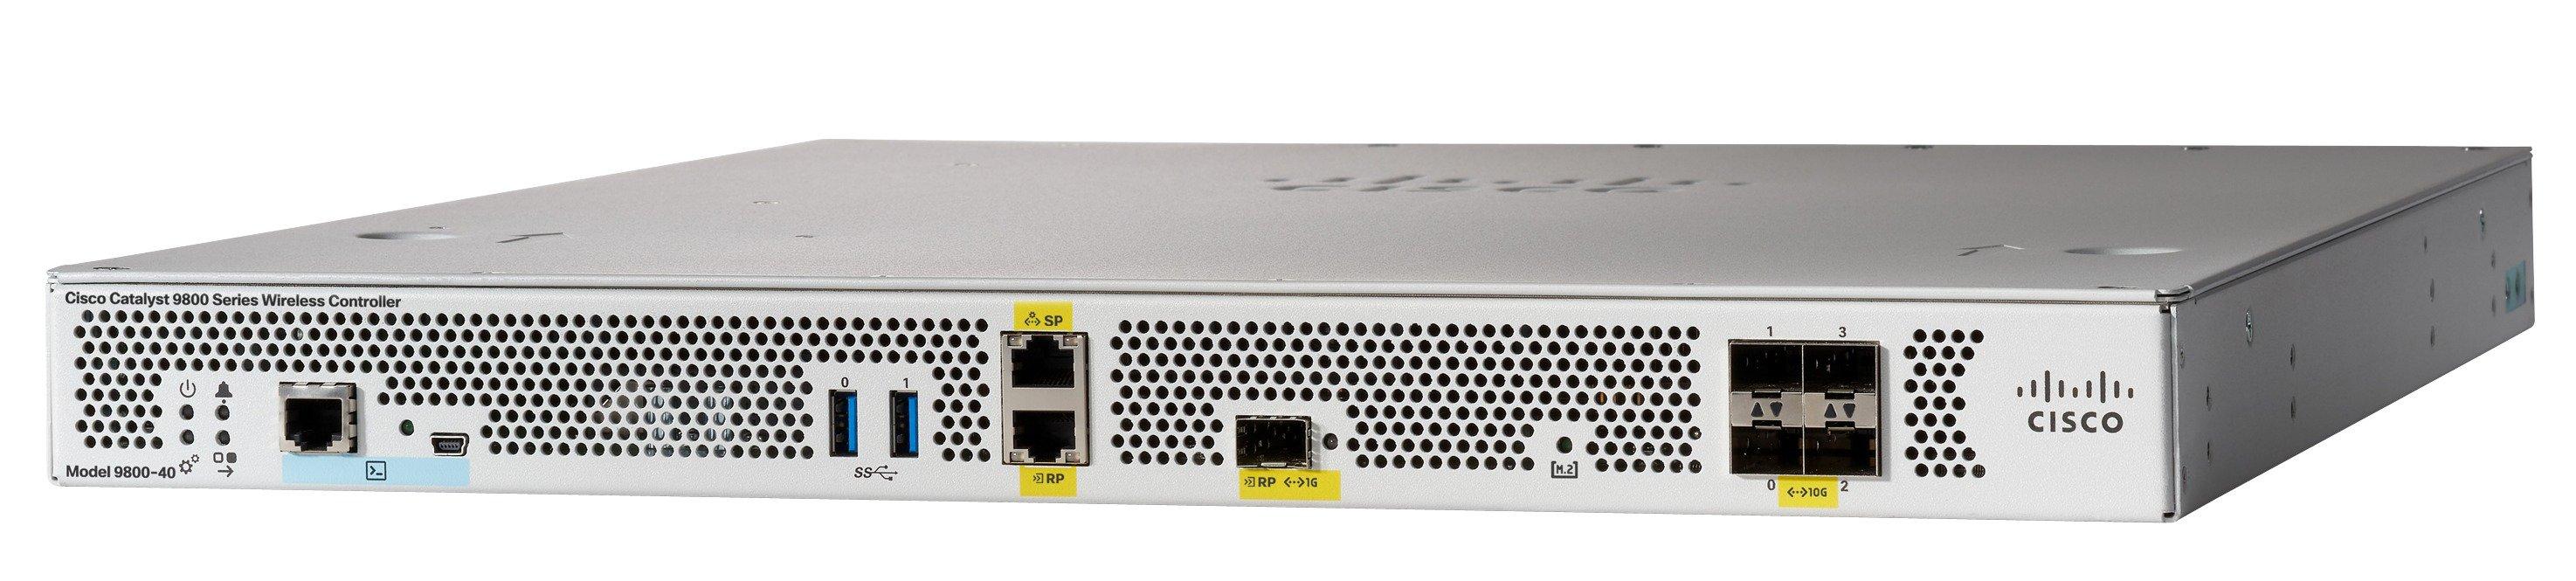 Cisco Catalyst 9800 Wireless Controller Series Deployment